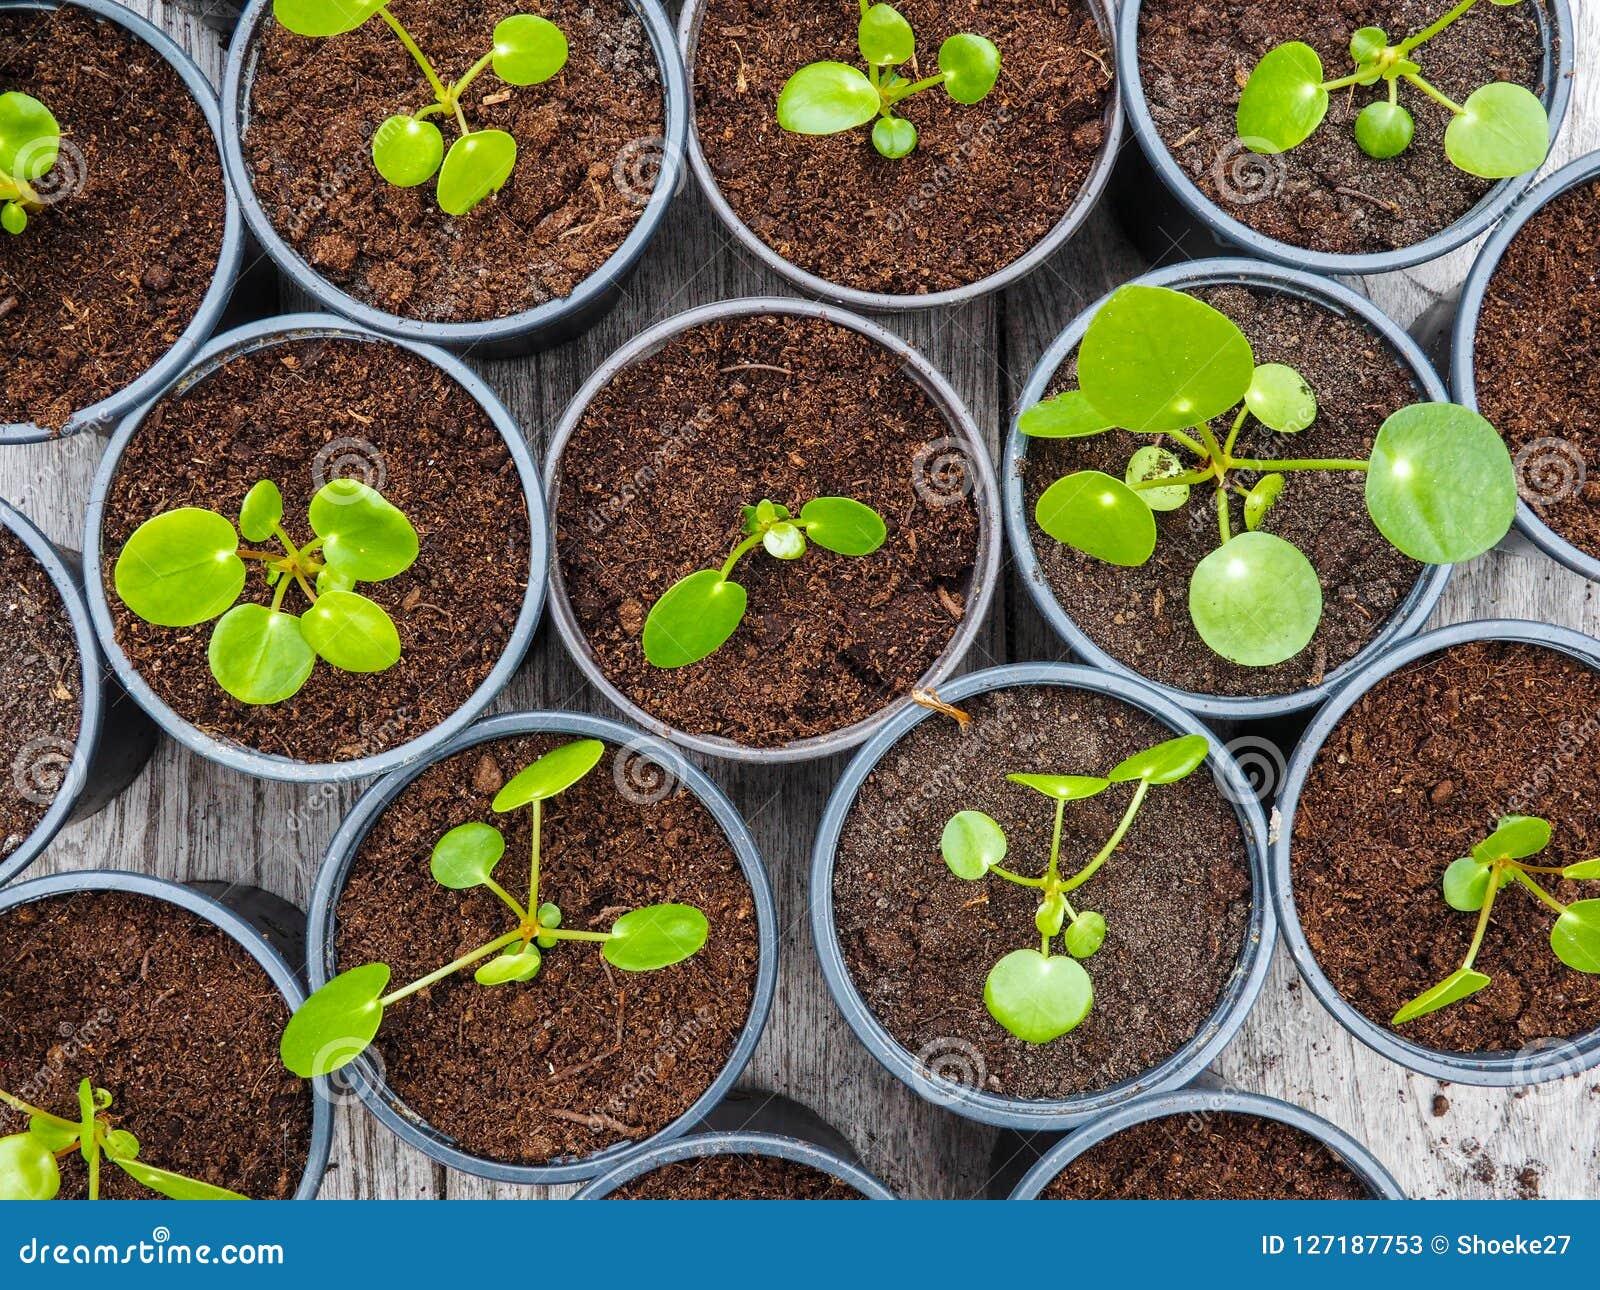 Multiple propagated pancake plant cuttings in black plastic pots